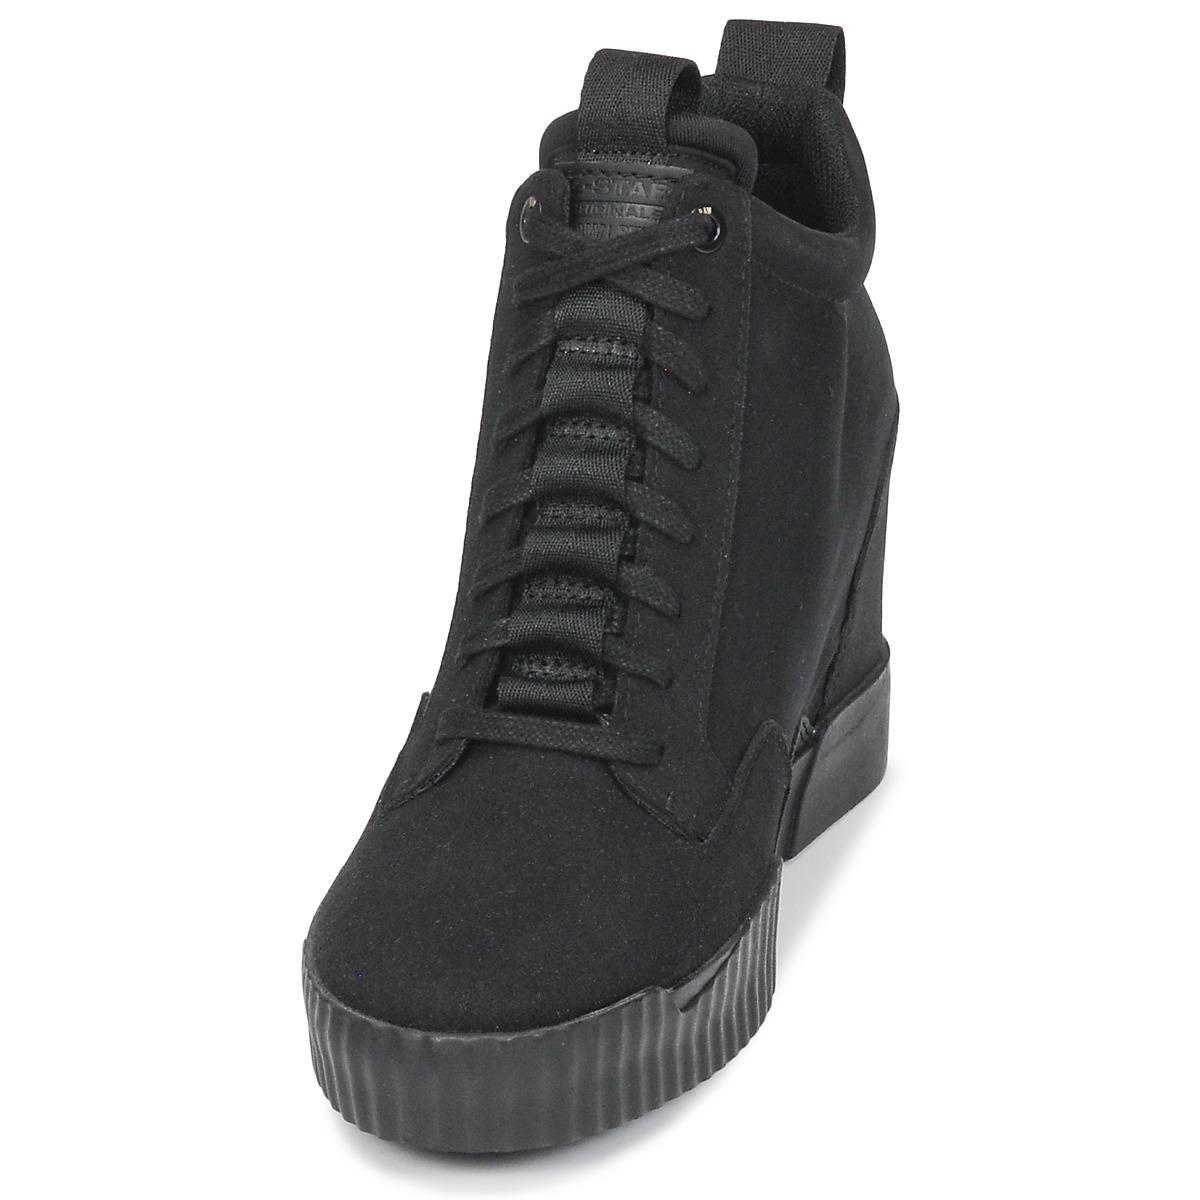 715b9e5d46a9 G-Star RAW - Rackam Core Wedge Women s Shoes (high-top Trainers). View  fullscreen